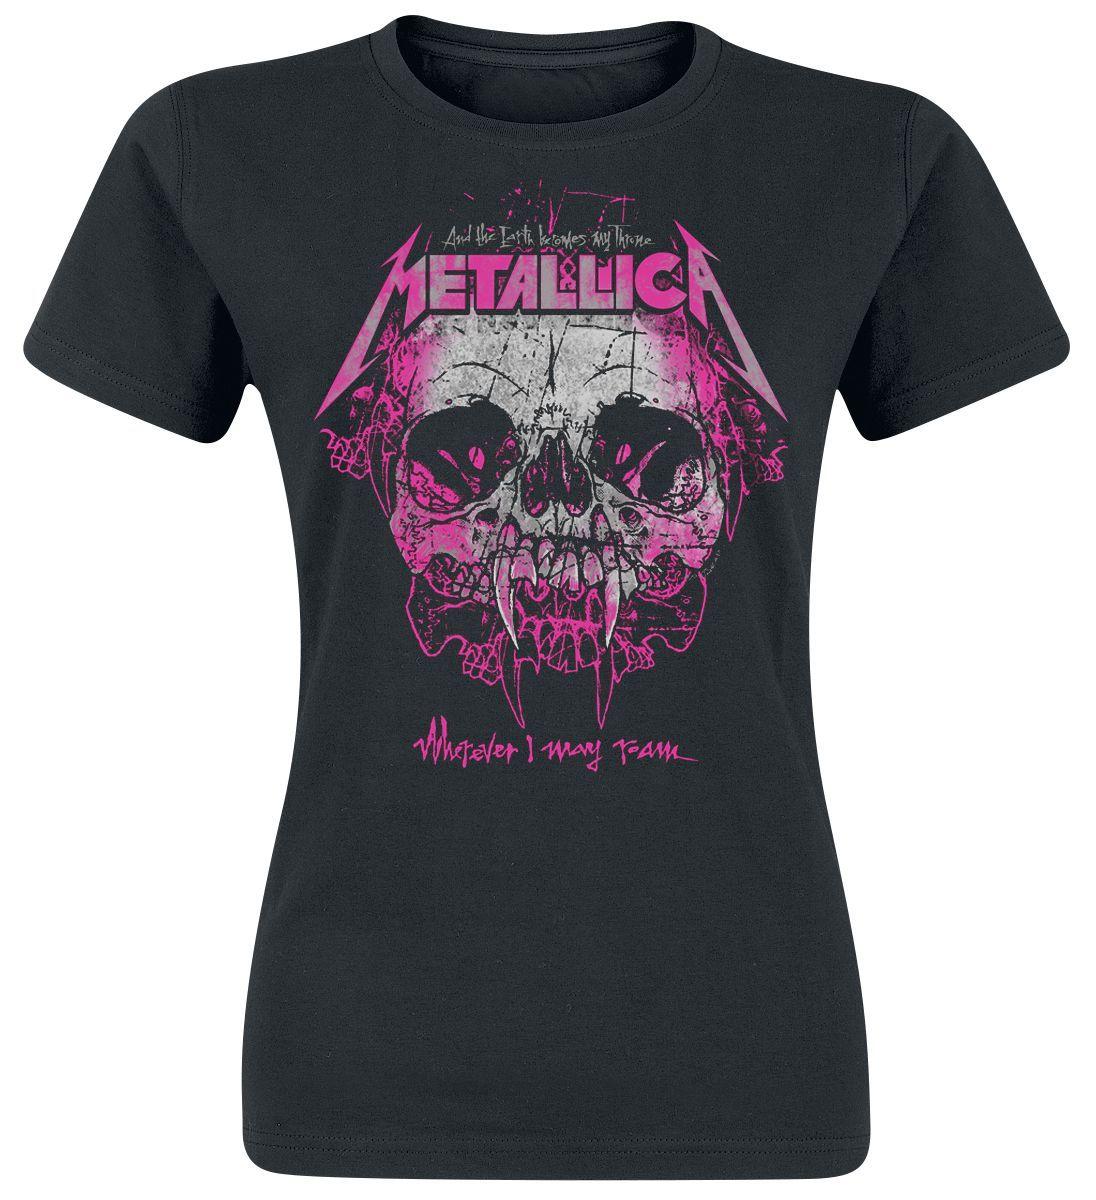 Sexy metallica t-shirts for girls